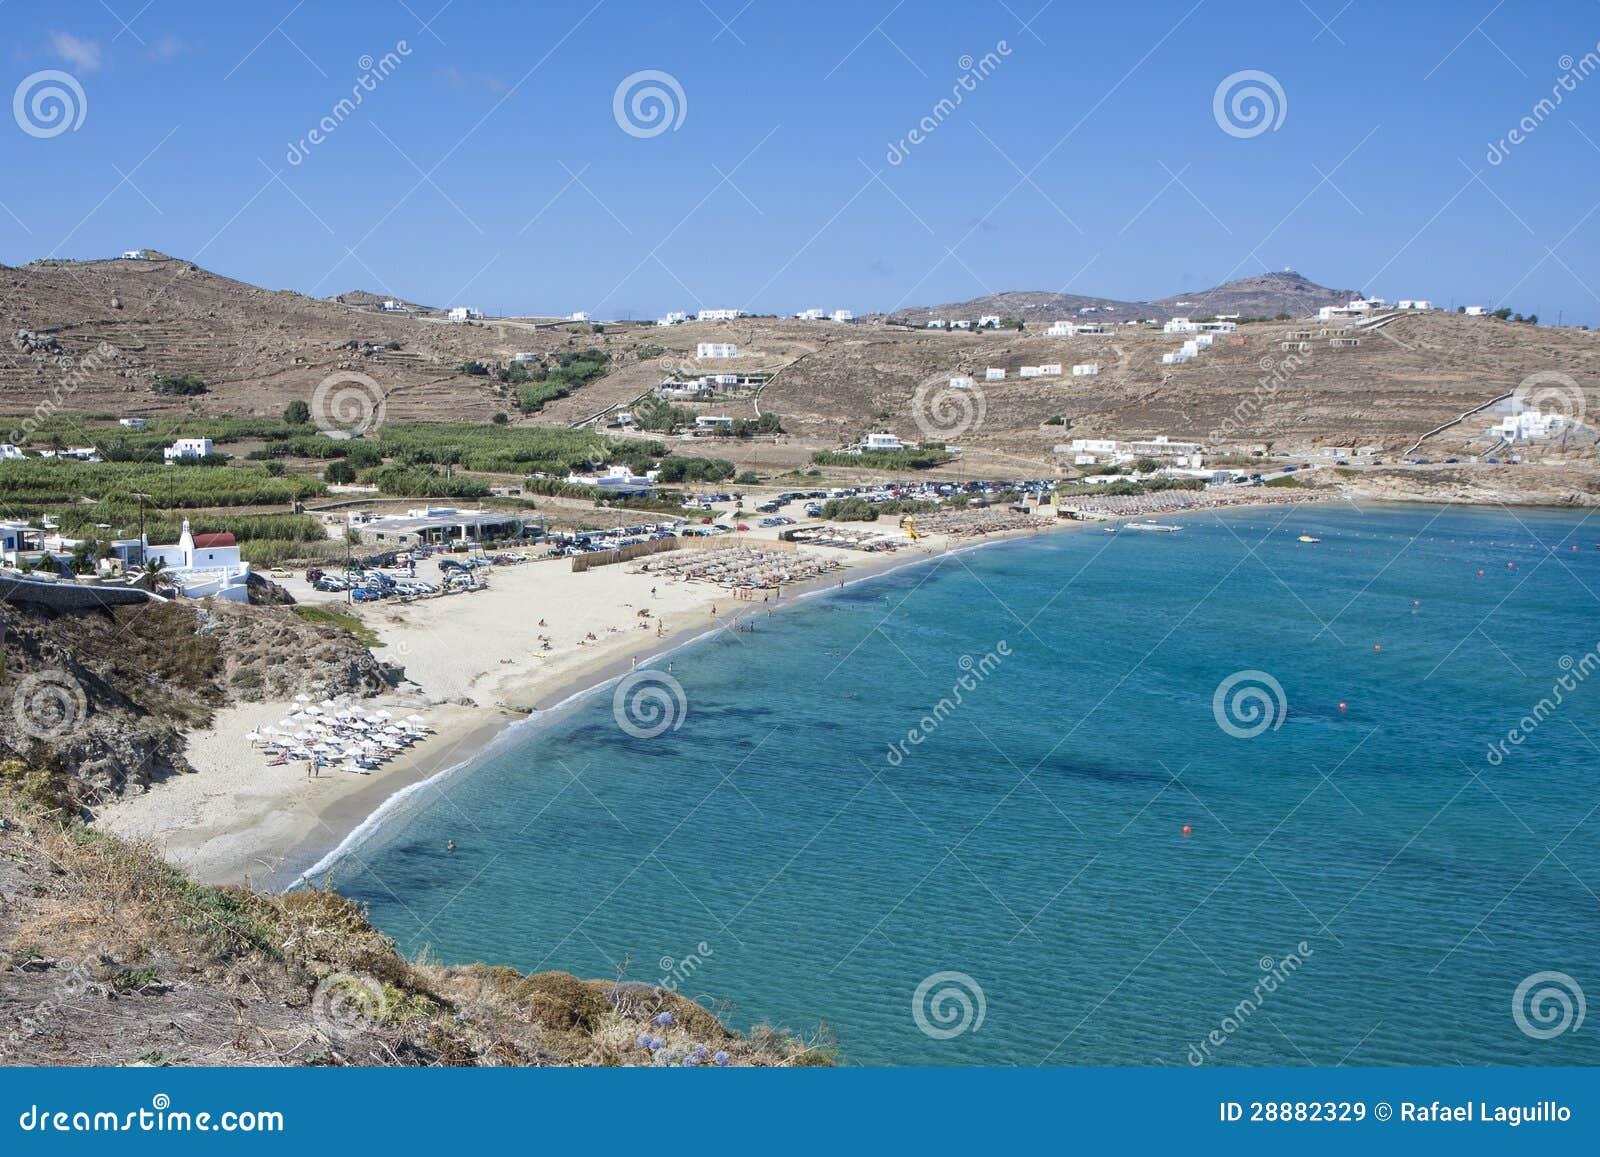 Kalo Livadi Beach In Mykonos Island Royalty Free Stock ...